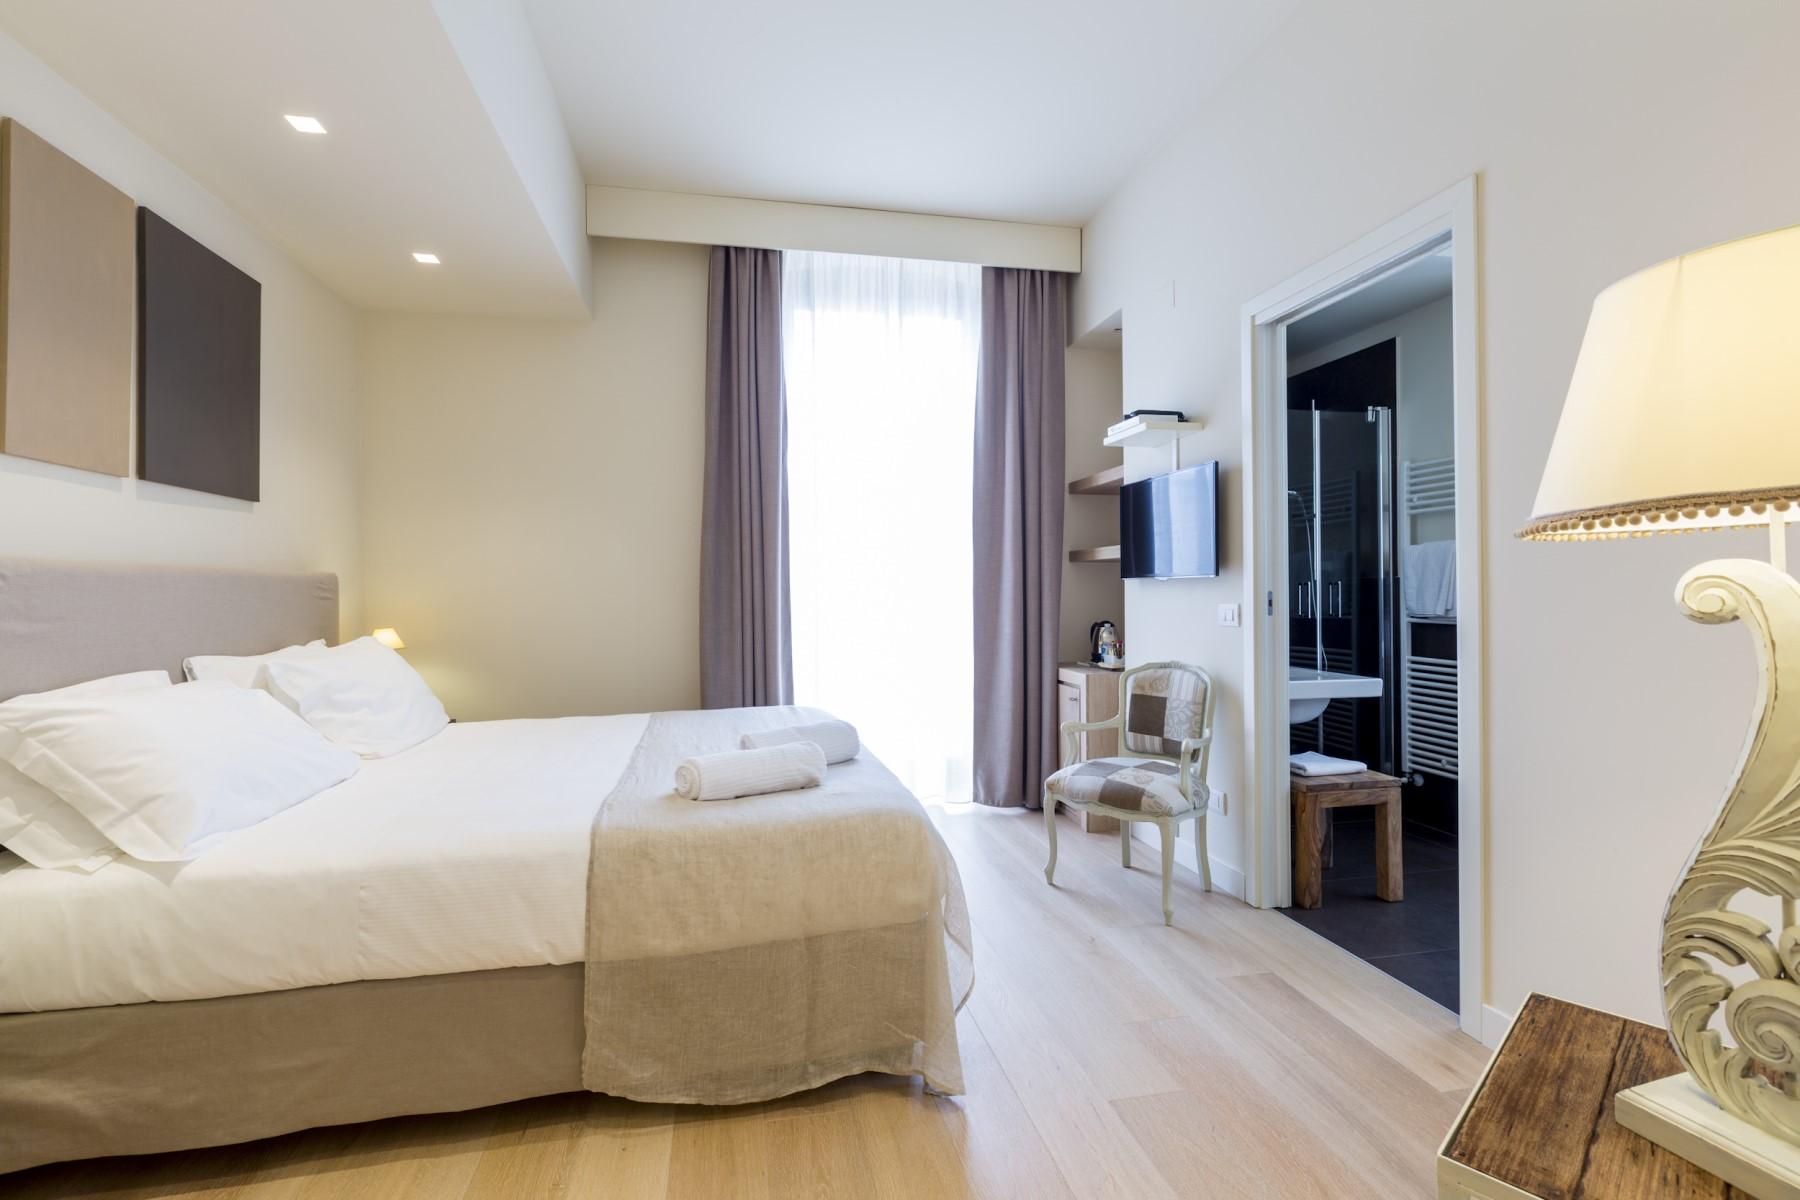 Camera Deluxe Room Hotel 900 Giulianova Luxury Business Leisure Vacanza